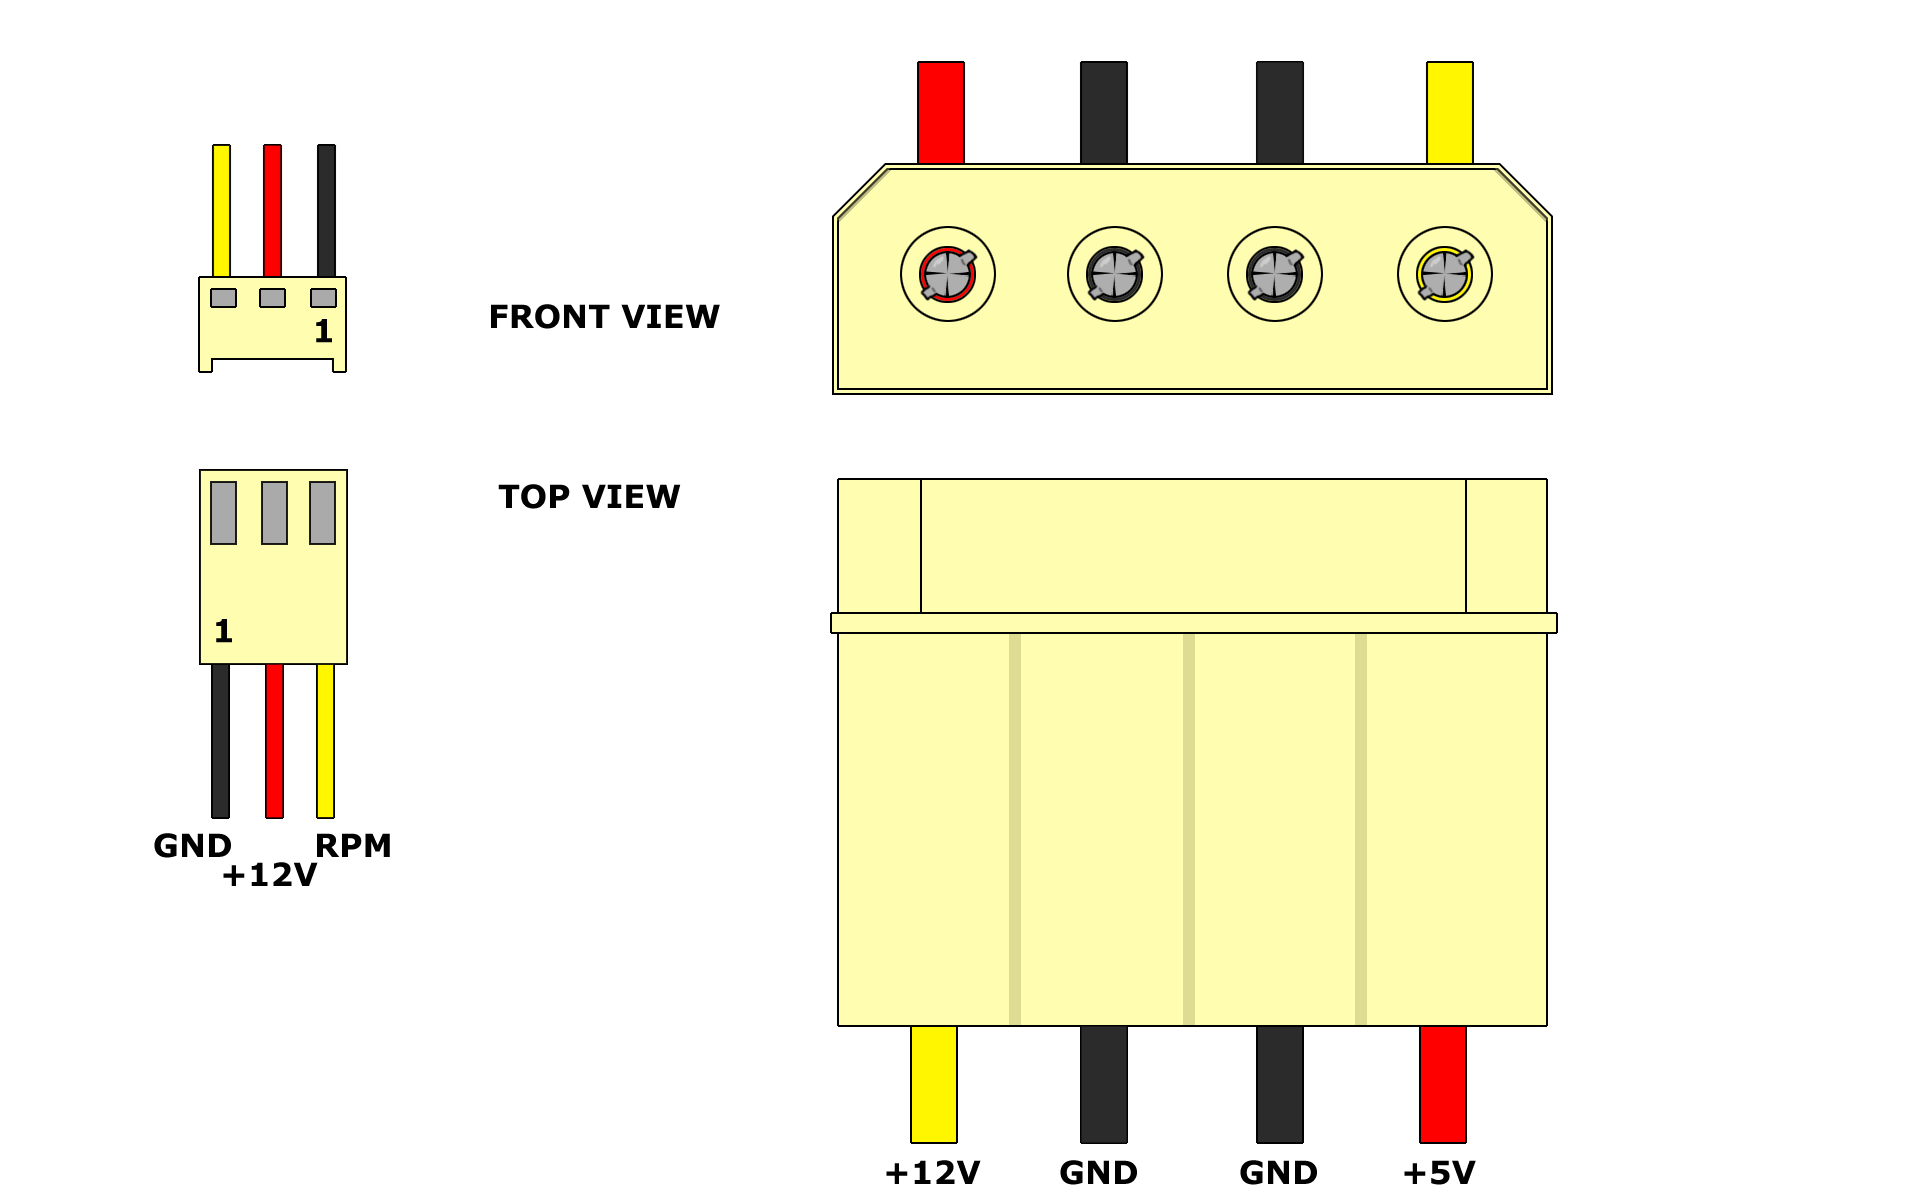 Scout Ii Wiring Diagram Turn Signal Schematics Diagrams International Electrical Pc 3 Pin Fan Wire Auto Rh Carwirringdiagram Herokuapp Com Ignition 62 80